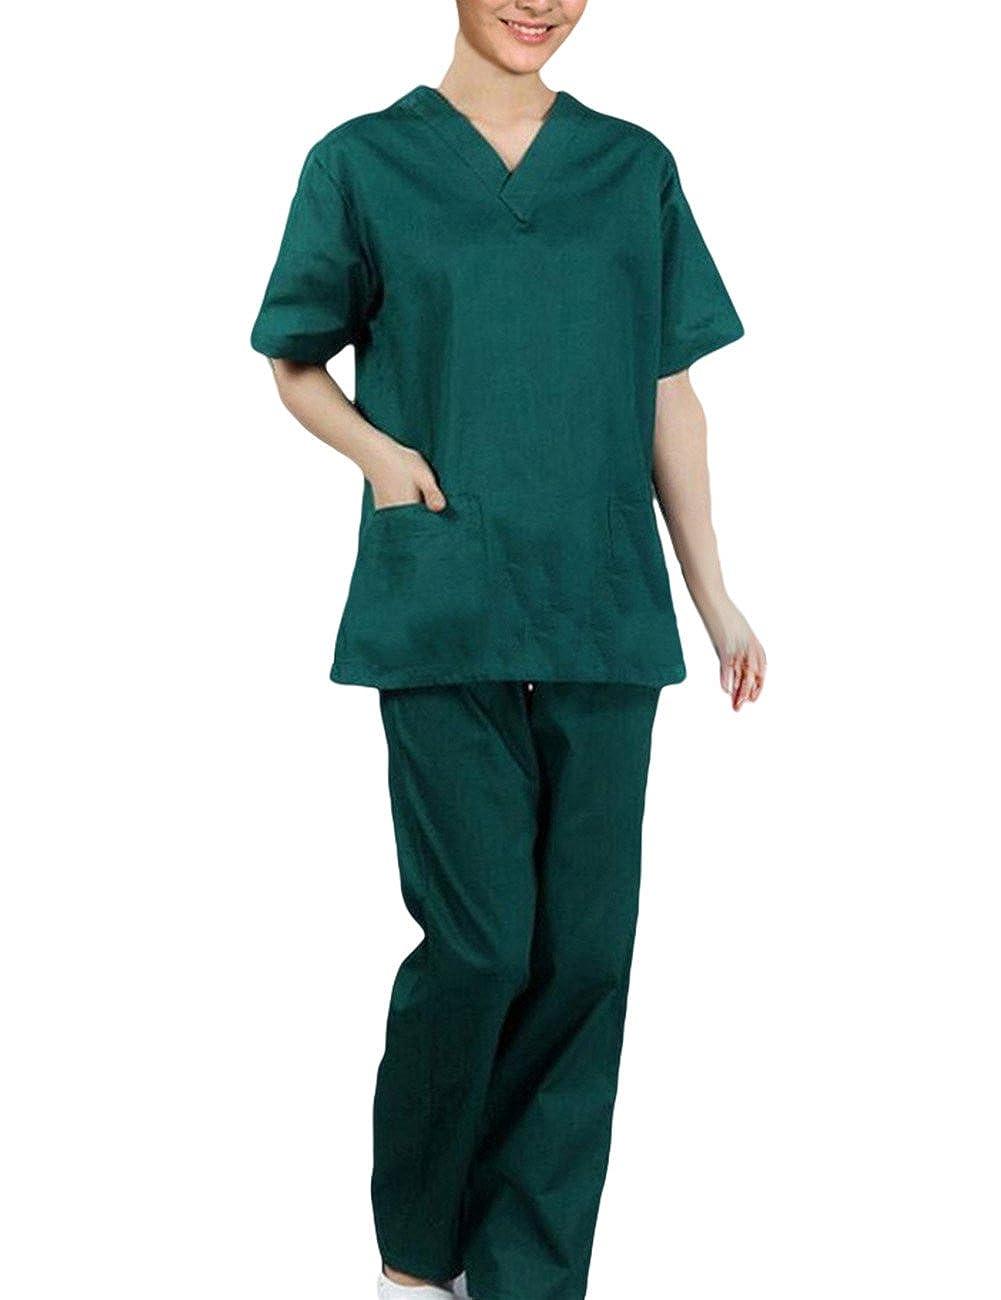 THEE Uniforme M/édico Ropa Enfermera de Manga Corta Bata M/édico Laboratorio Enfermera Sanitaria